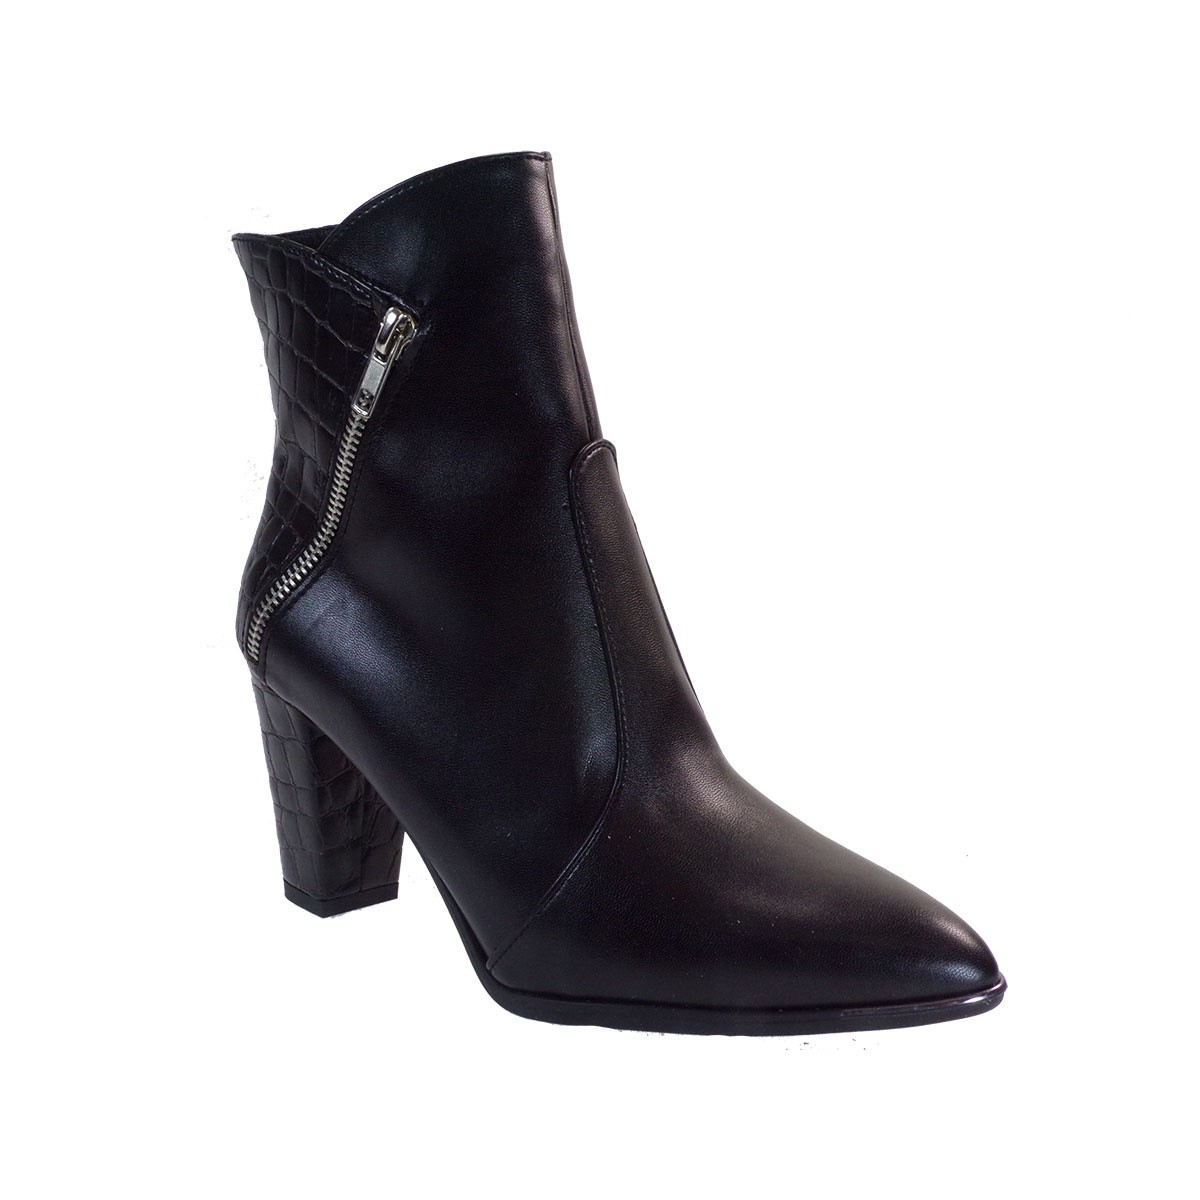 Smart Cronos Γυναικεία Παπούτσια Μποτάκια 7149-2716 Μαύρο